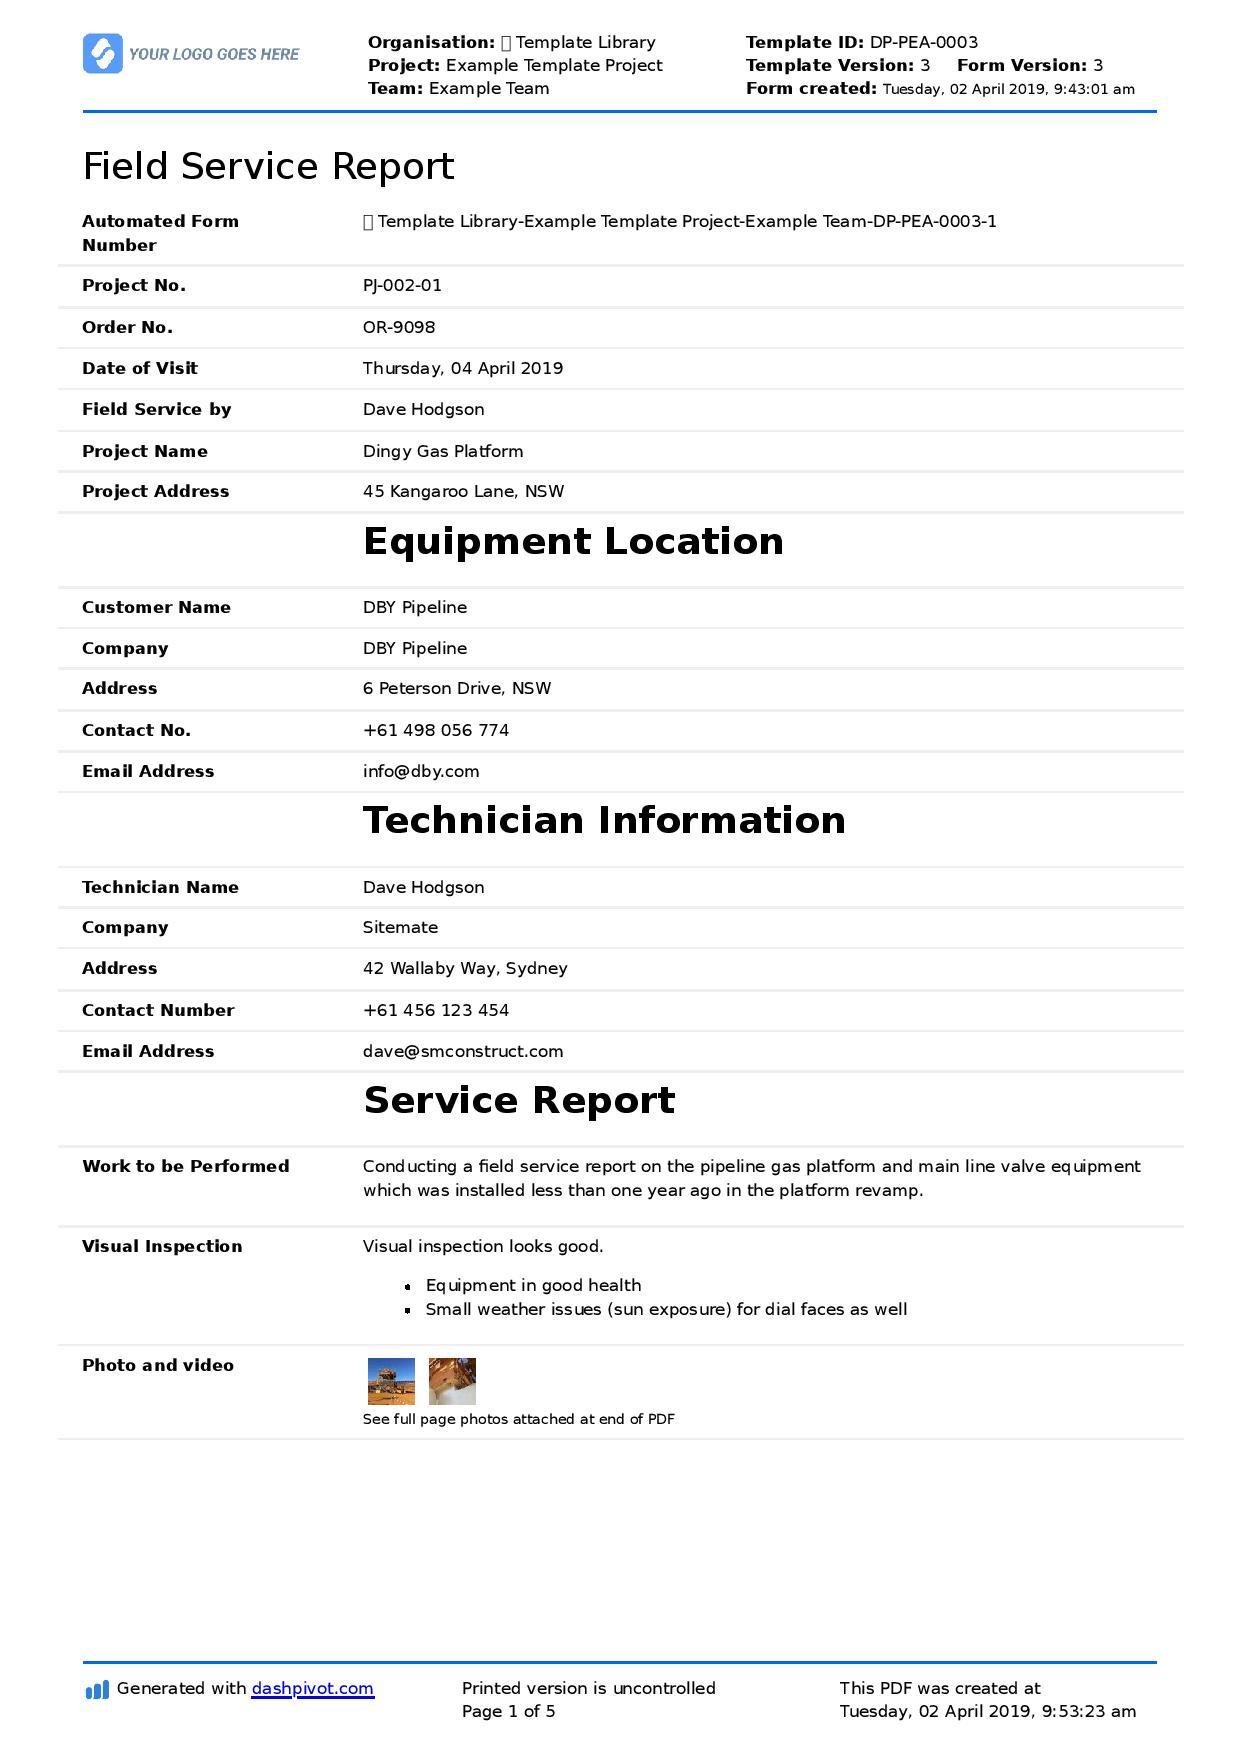 Field Service Report Template (Better Format Than Word In Technical Service Report Template